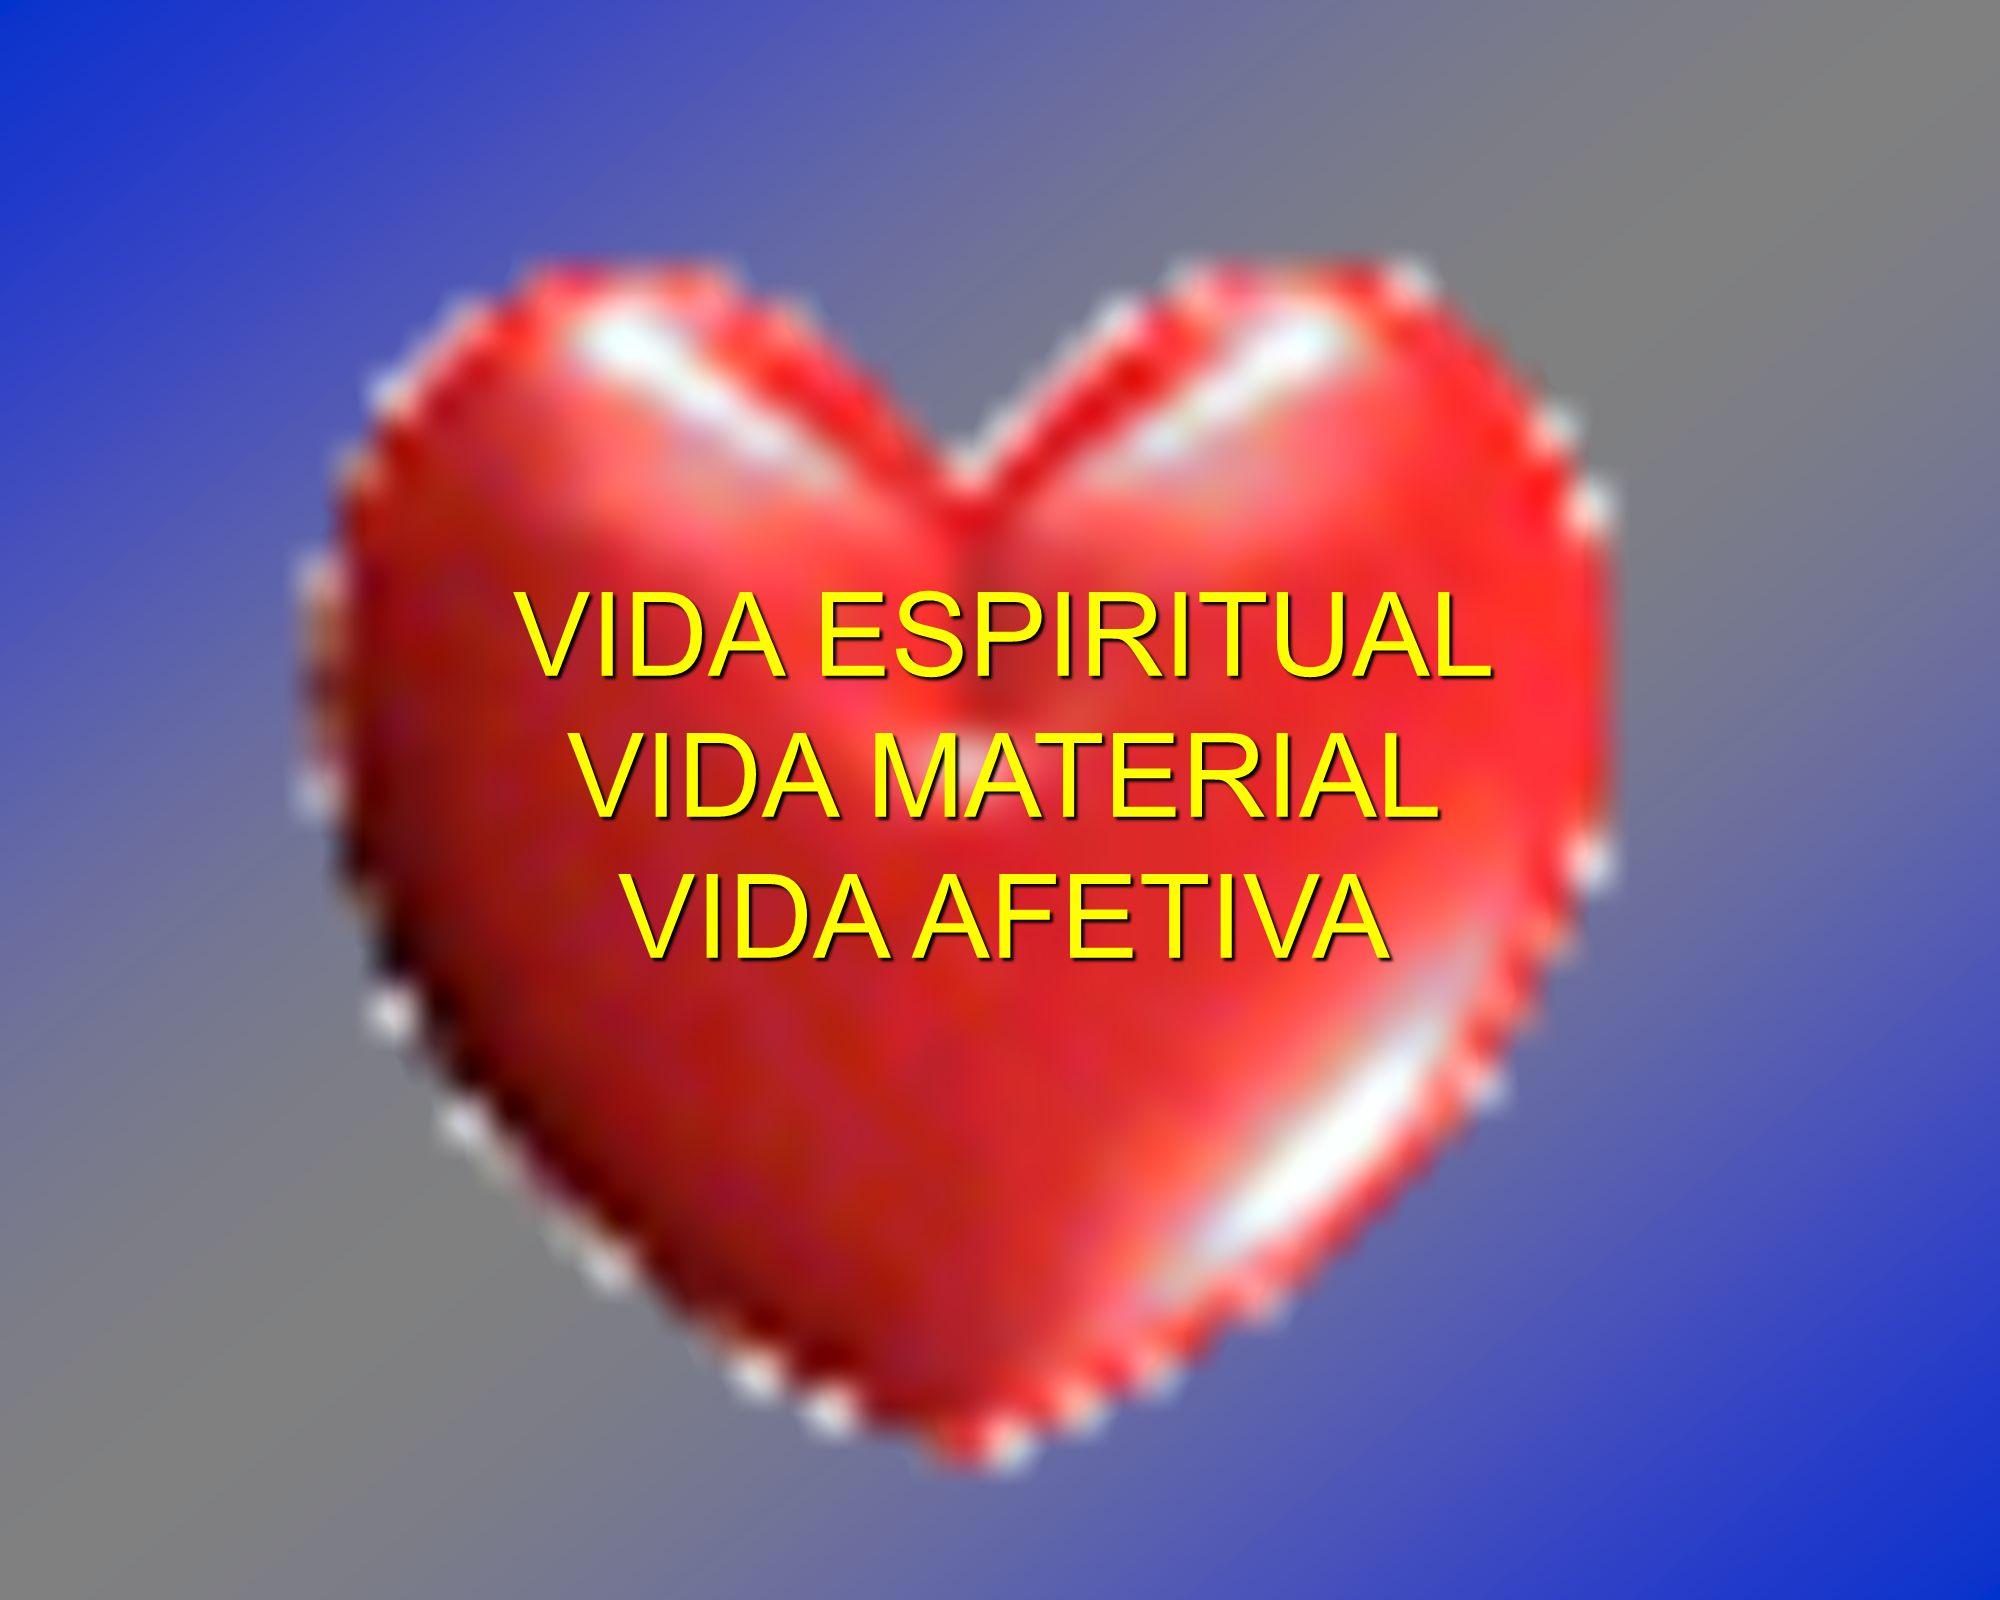 VIDA ESPIRITUAL VIDA MATERIAL VIDA AFETIVA